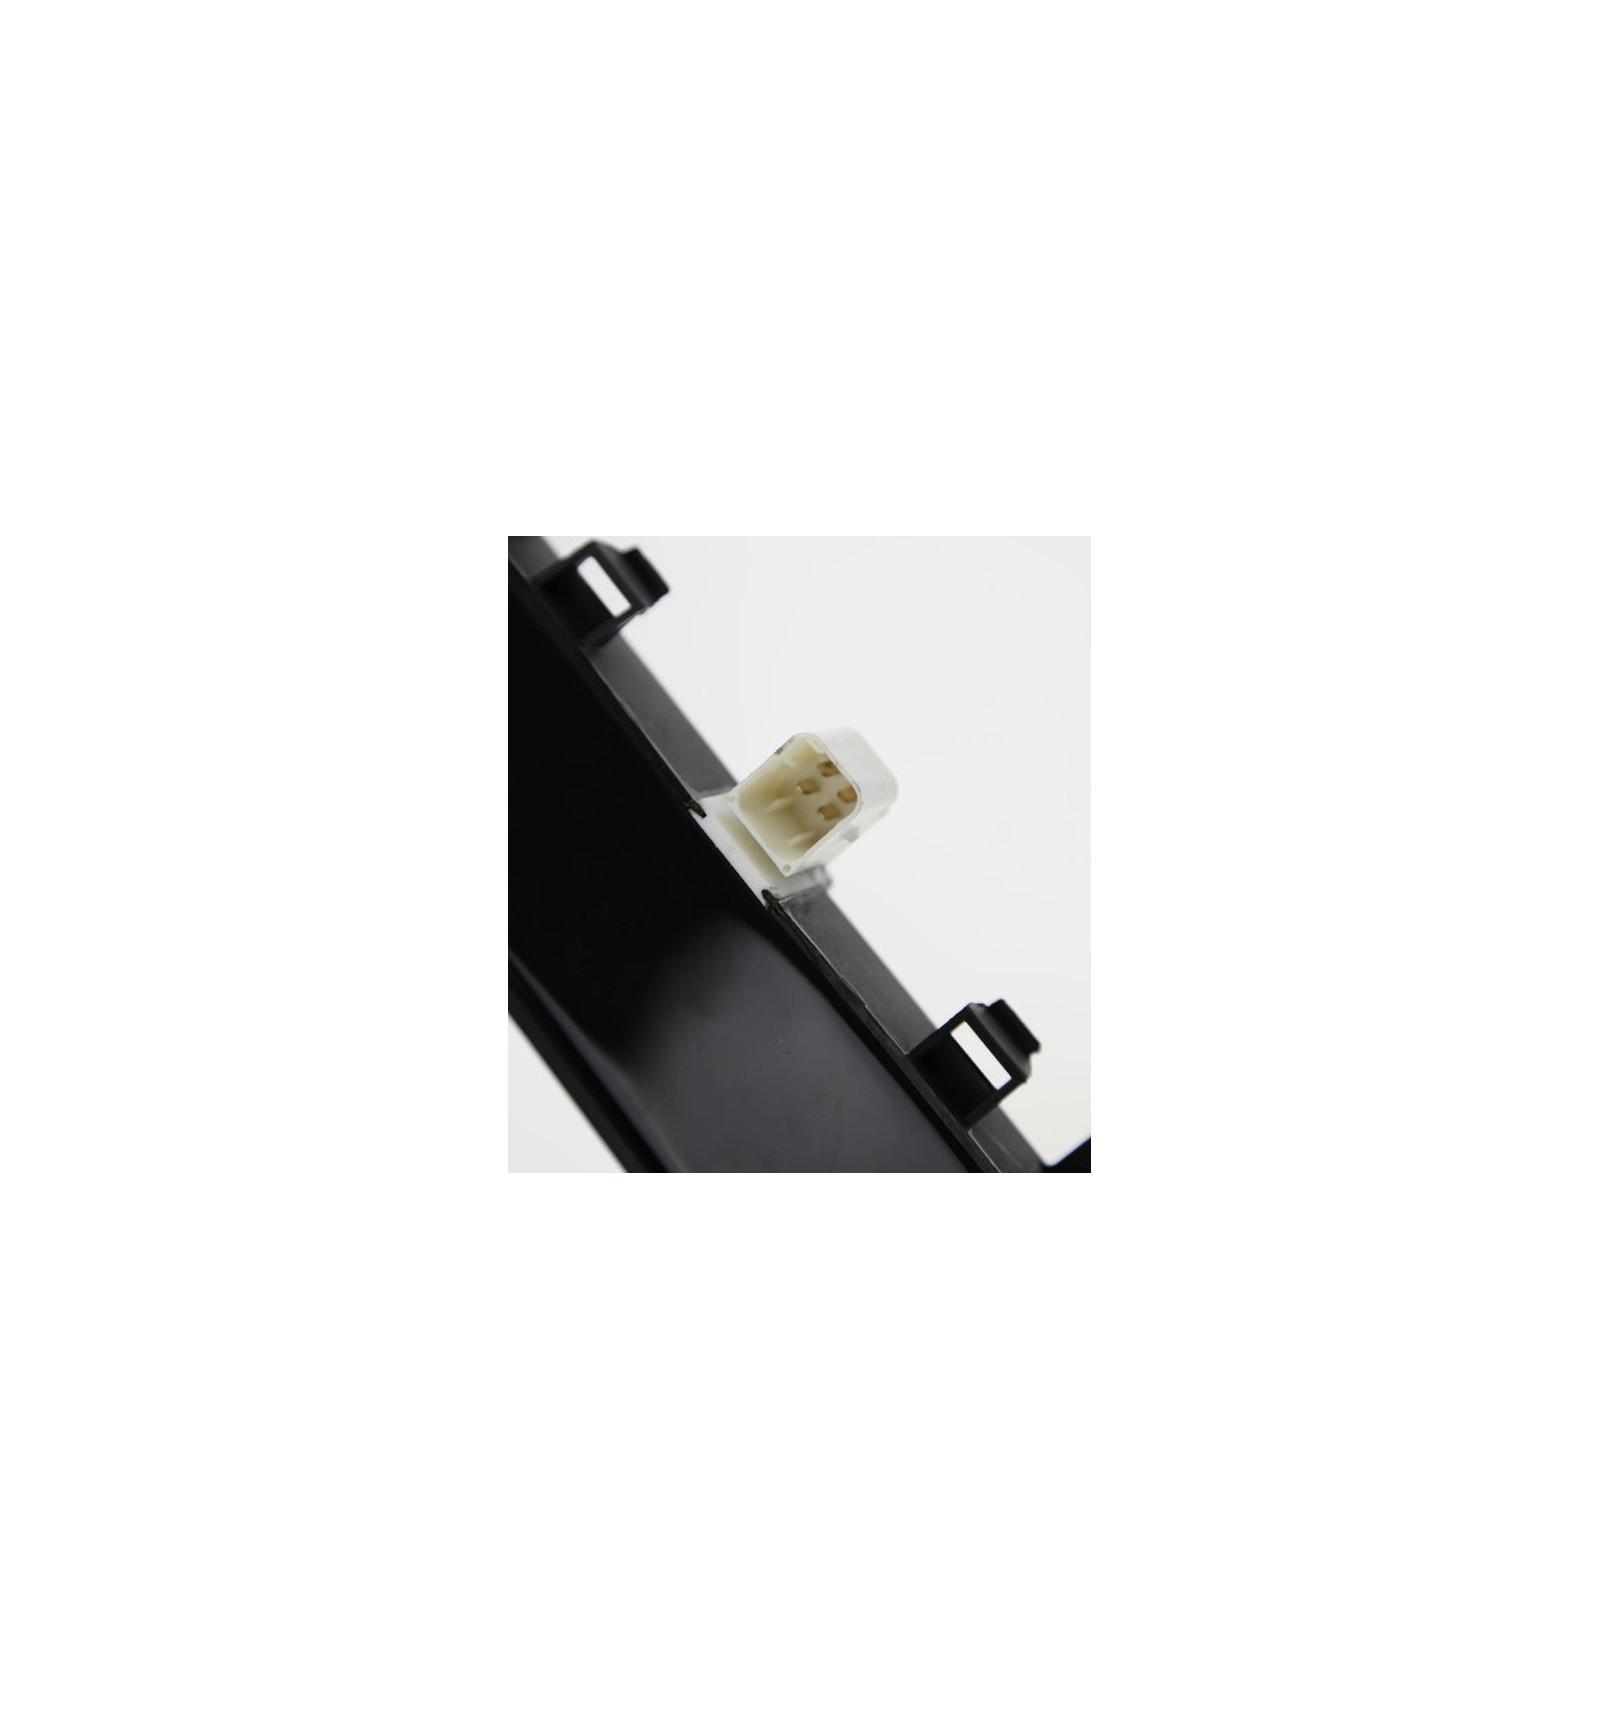 bobine d 39 allumage berlingo xsara saxo picasso peugeot 106. Black Bedroom Furniture Sets. Home Design Ideas